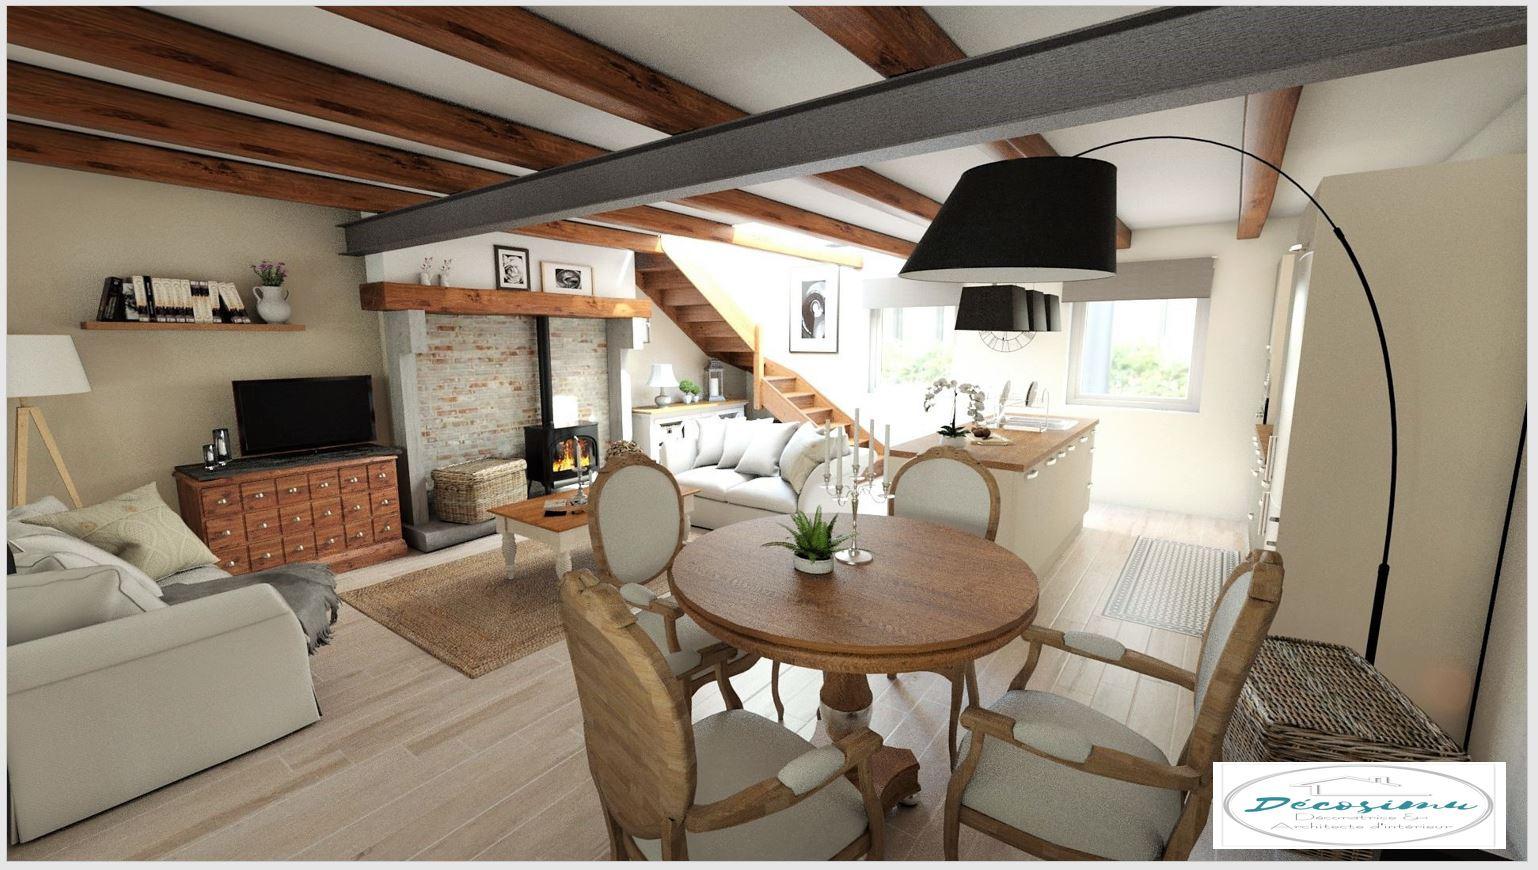 Maison Style Campagne relooking 3d d'une ancienne maison en un style campagne chic